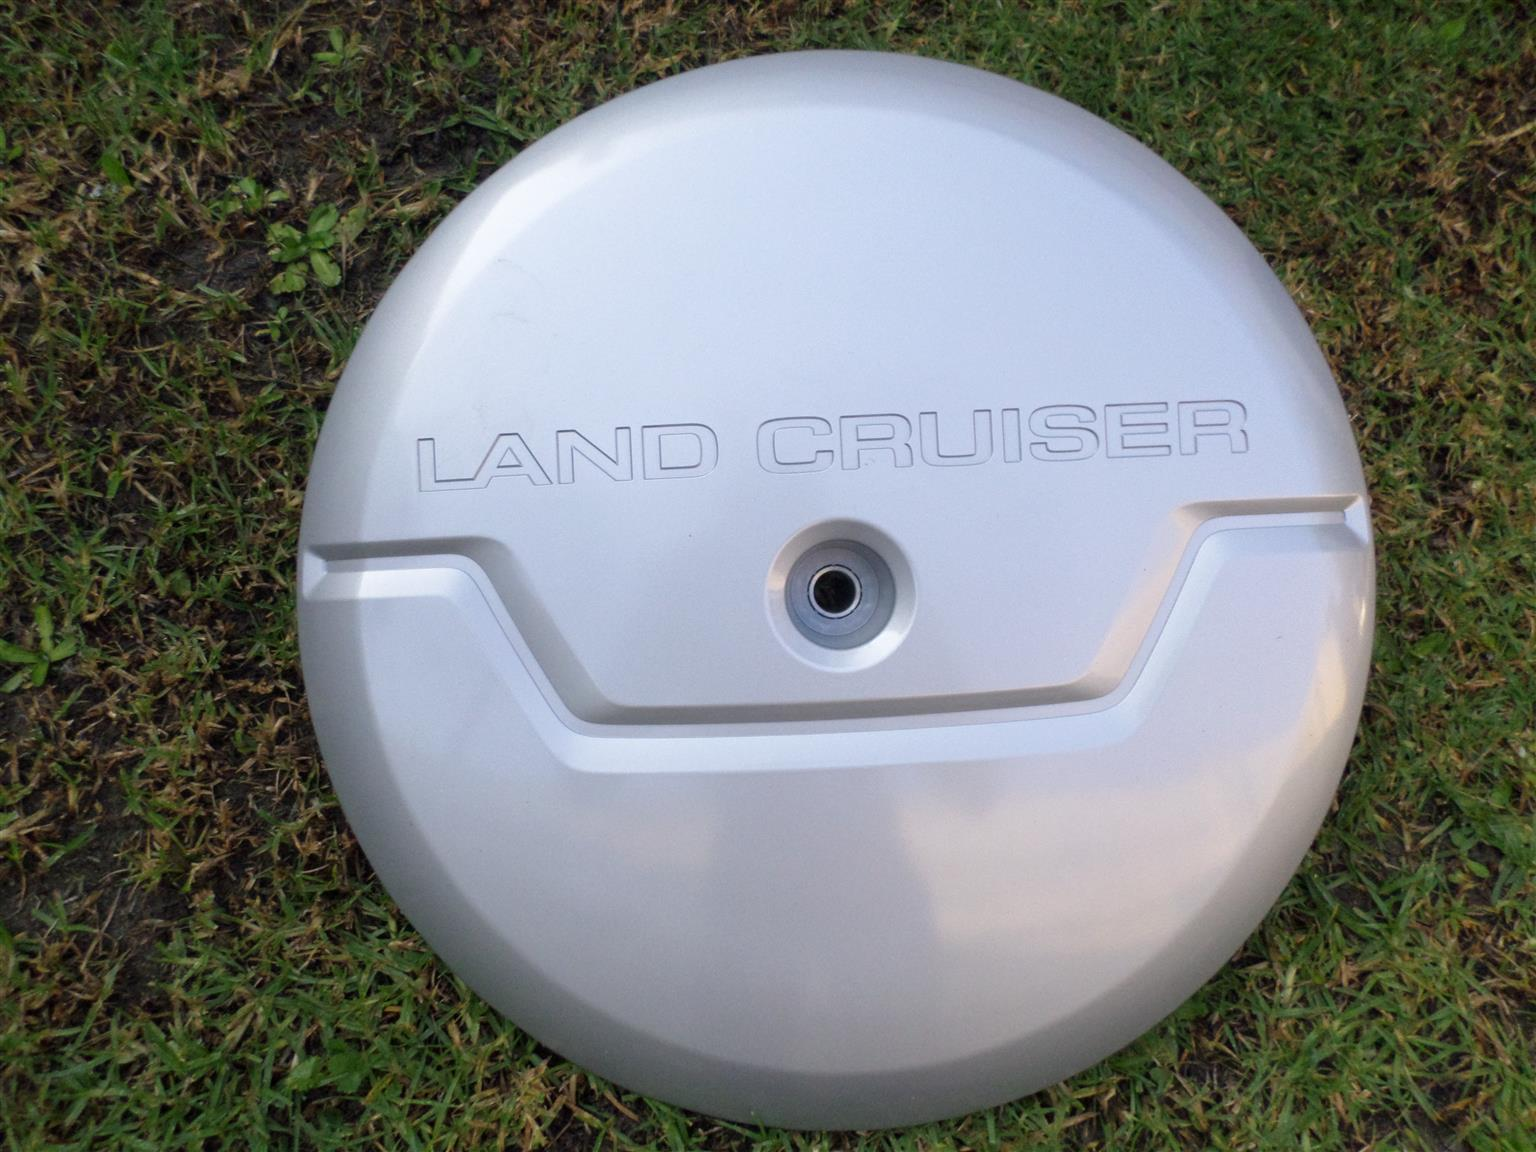 2004 TOYOTA LAND CRUISER PRADO SPARE WHEEL COVER FOR SALE. BRAND NEW